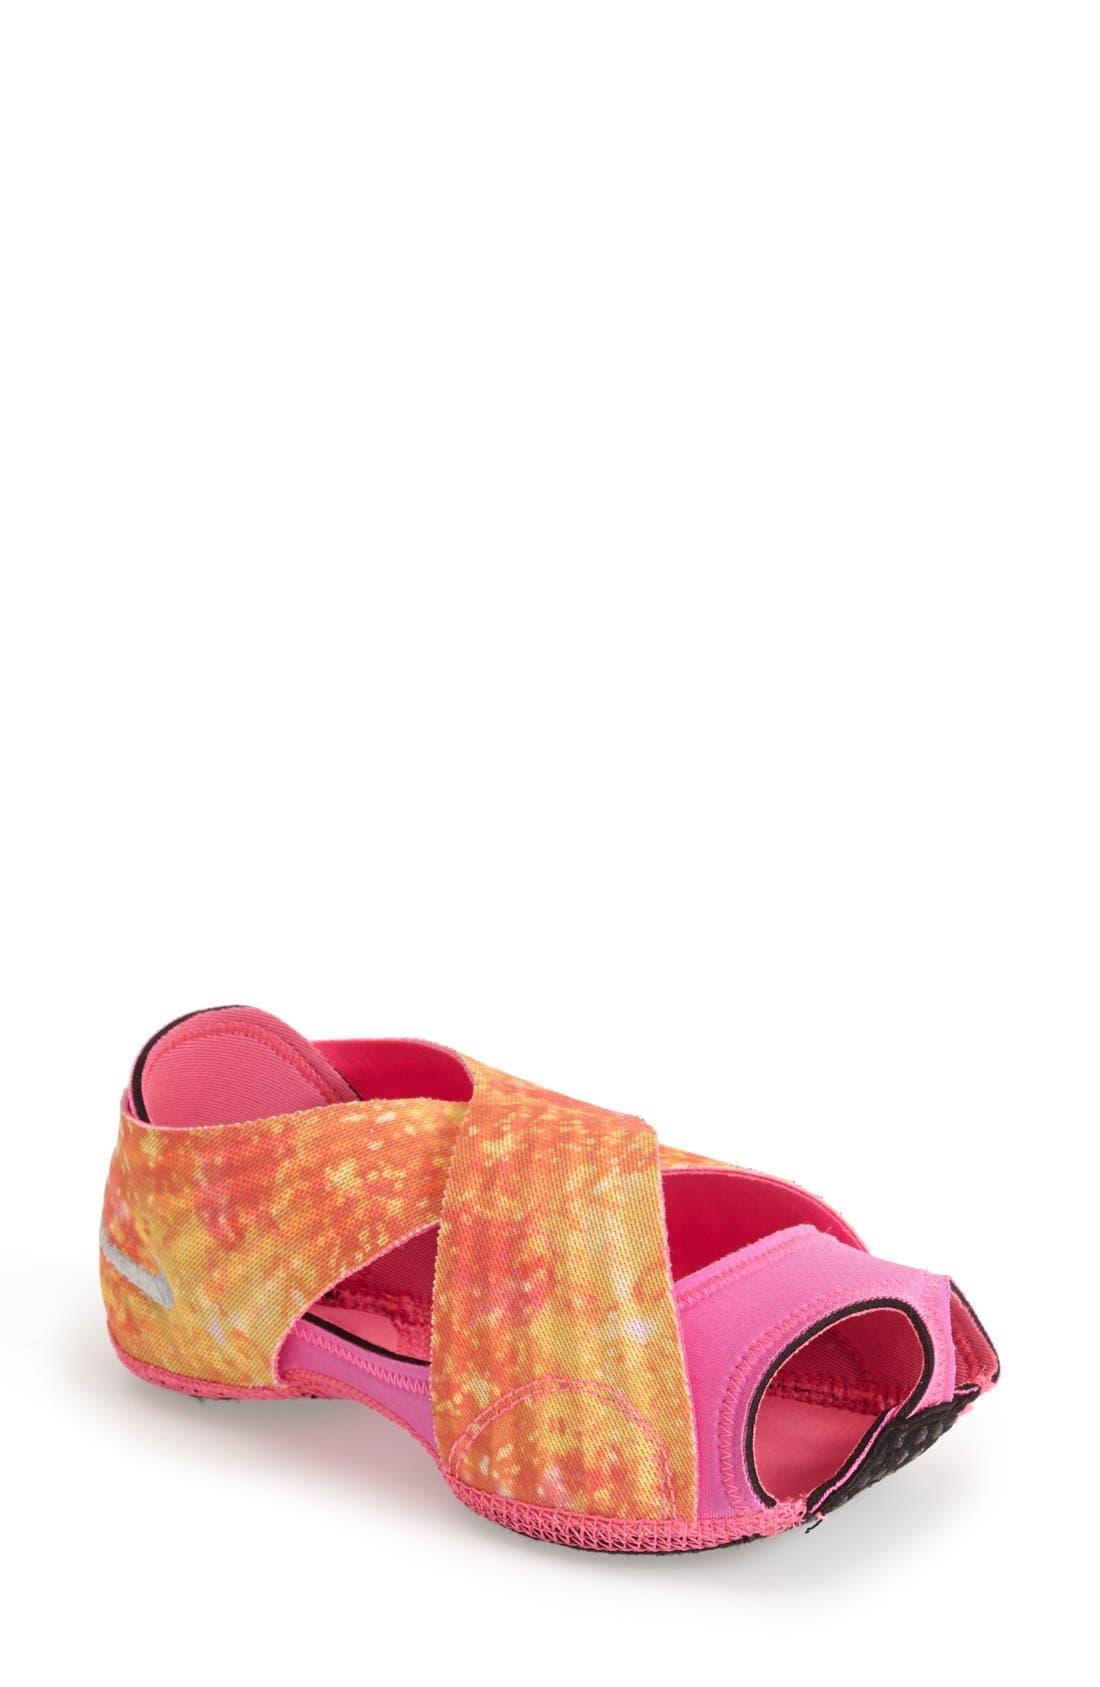 Alternate Image 1 Selected - Nike 'Studio Wrap 3' Yoga Training Shoe (Women)